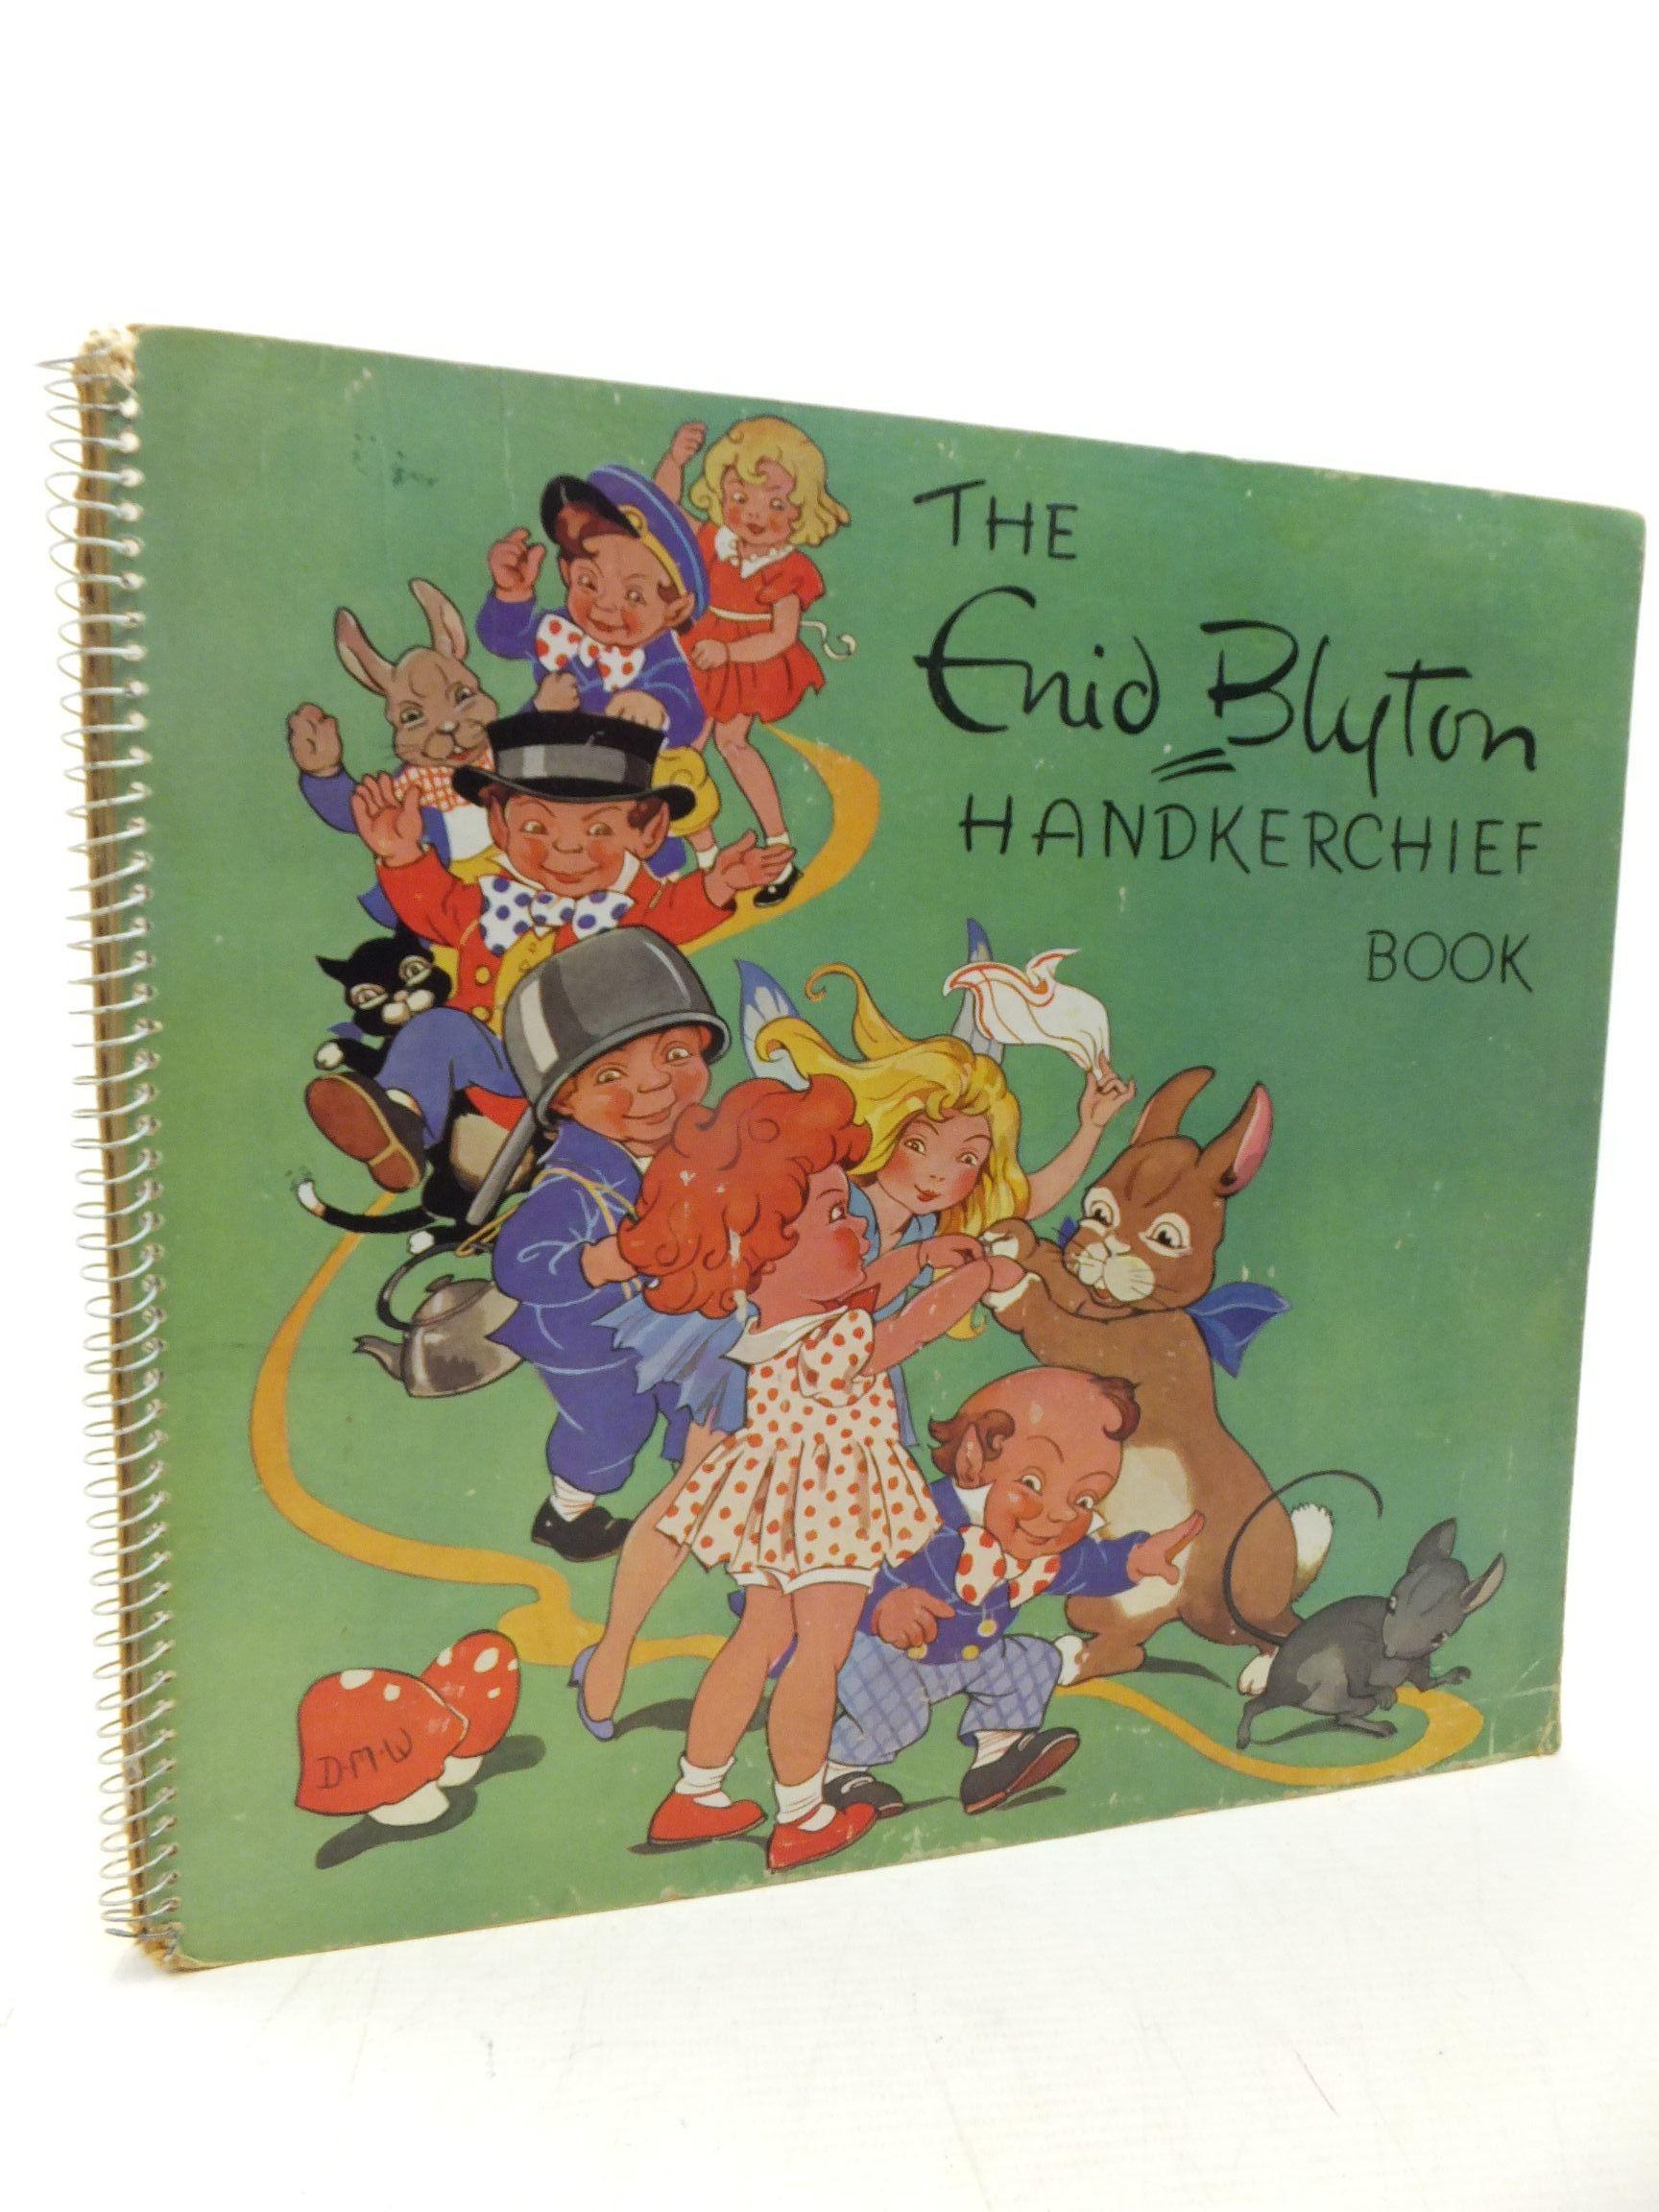 The Enid Blyton Handkerchief Book